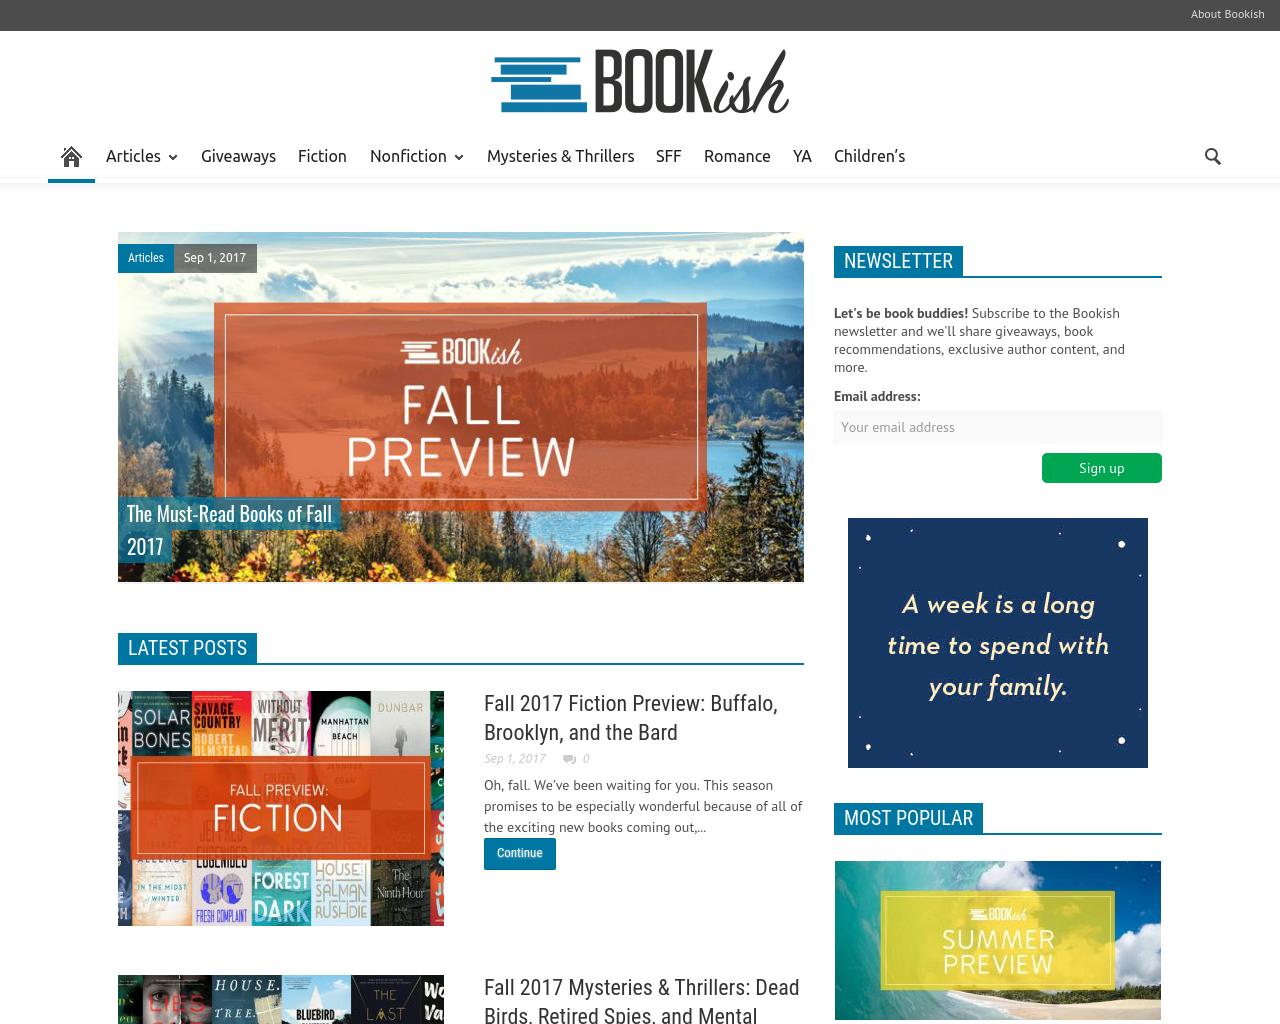 Bookish-Advertising-Reviews-Pricing